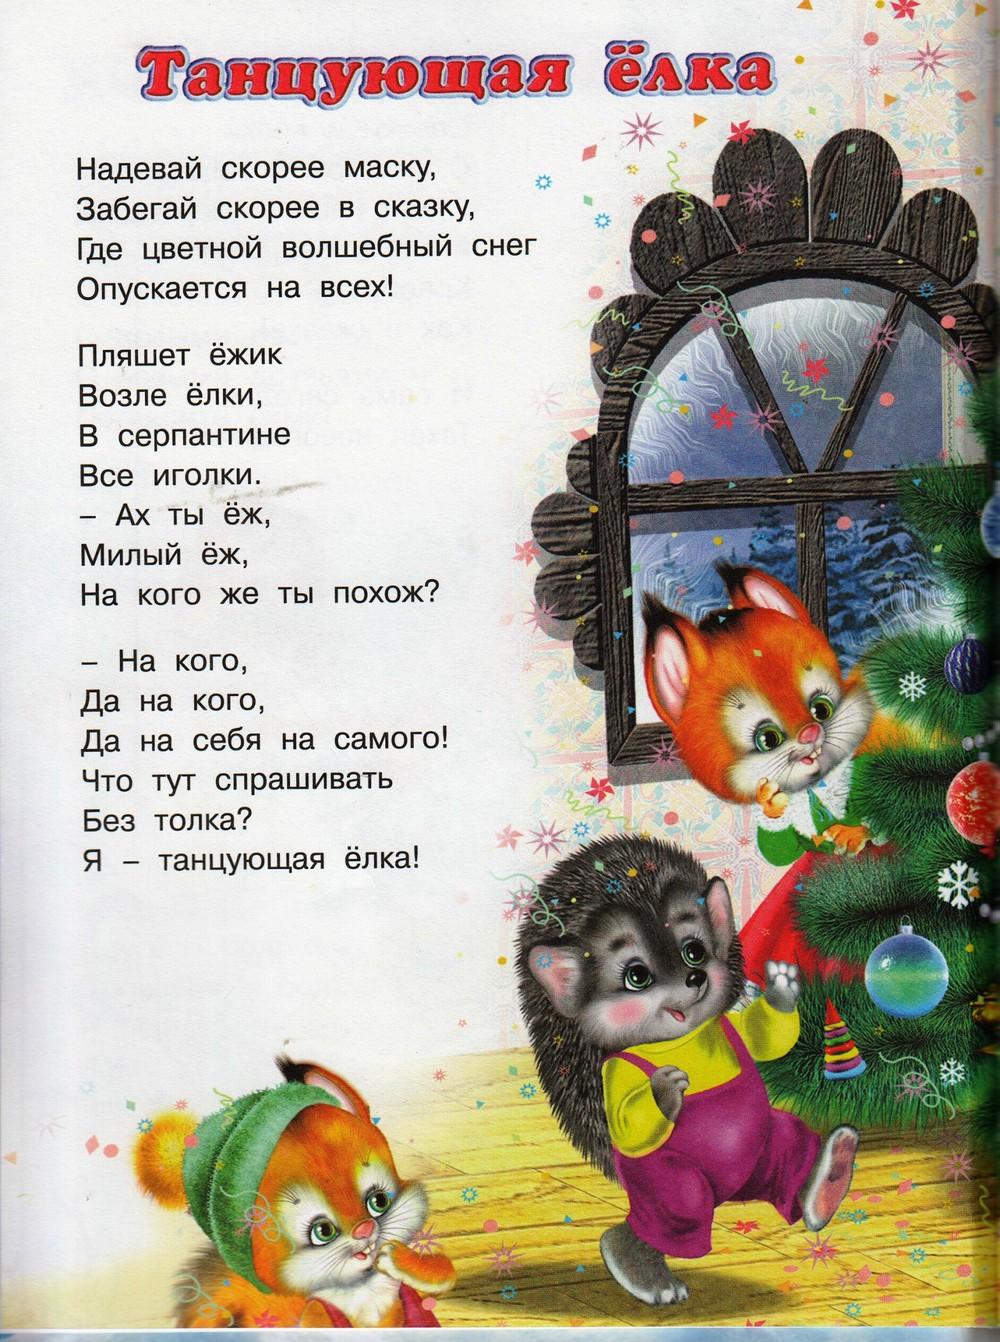 http://i5.imageban.ru/out/2013/12/19/87cfa1de62e7396606ae5ca9171c92ec.jpg